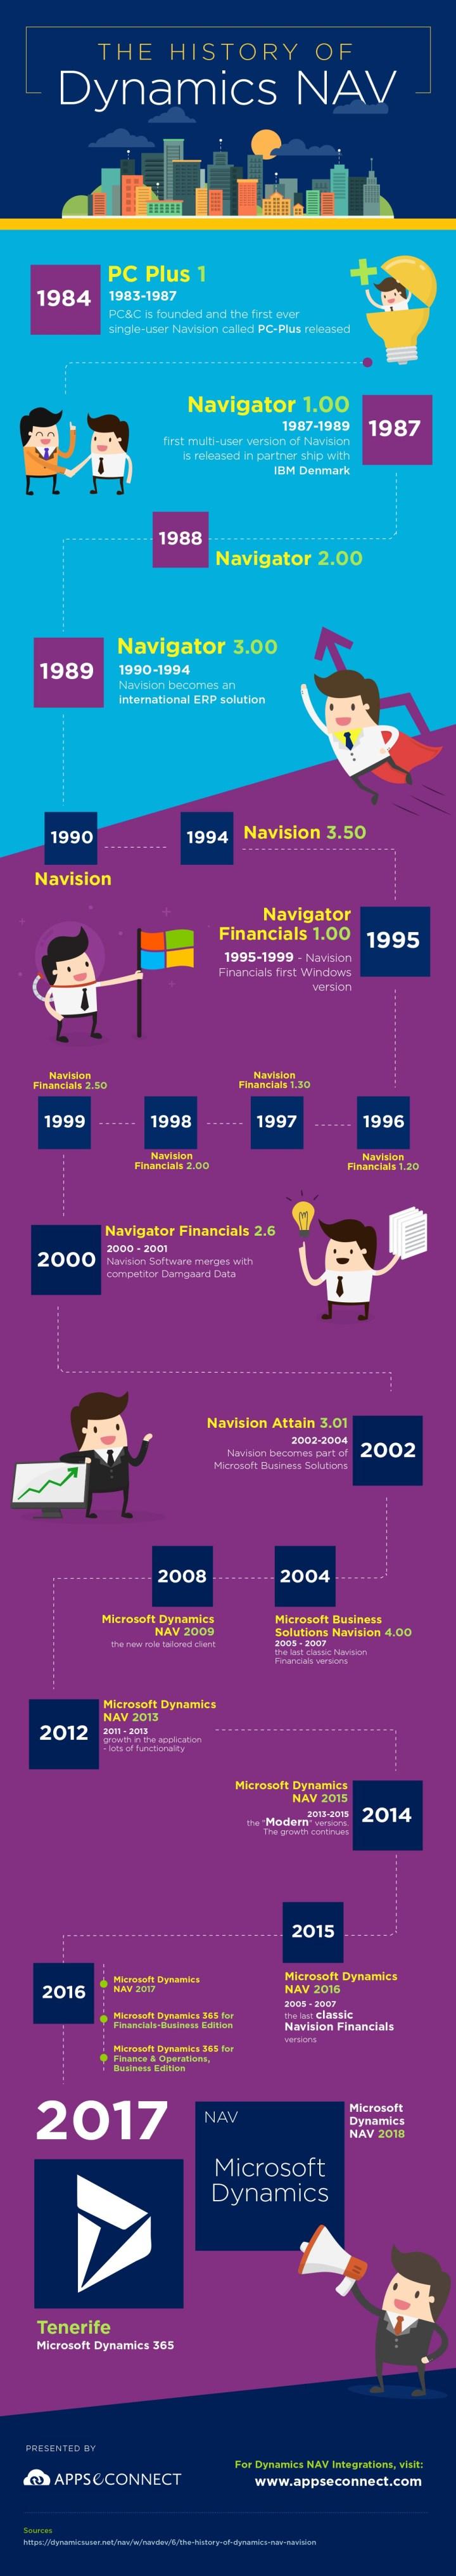 Evolution-of-Microsoft-Dynamics-Nav-Infographic